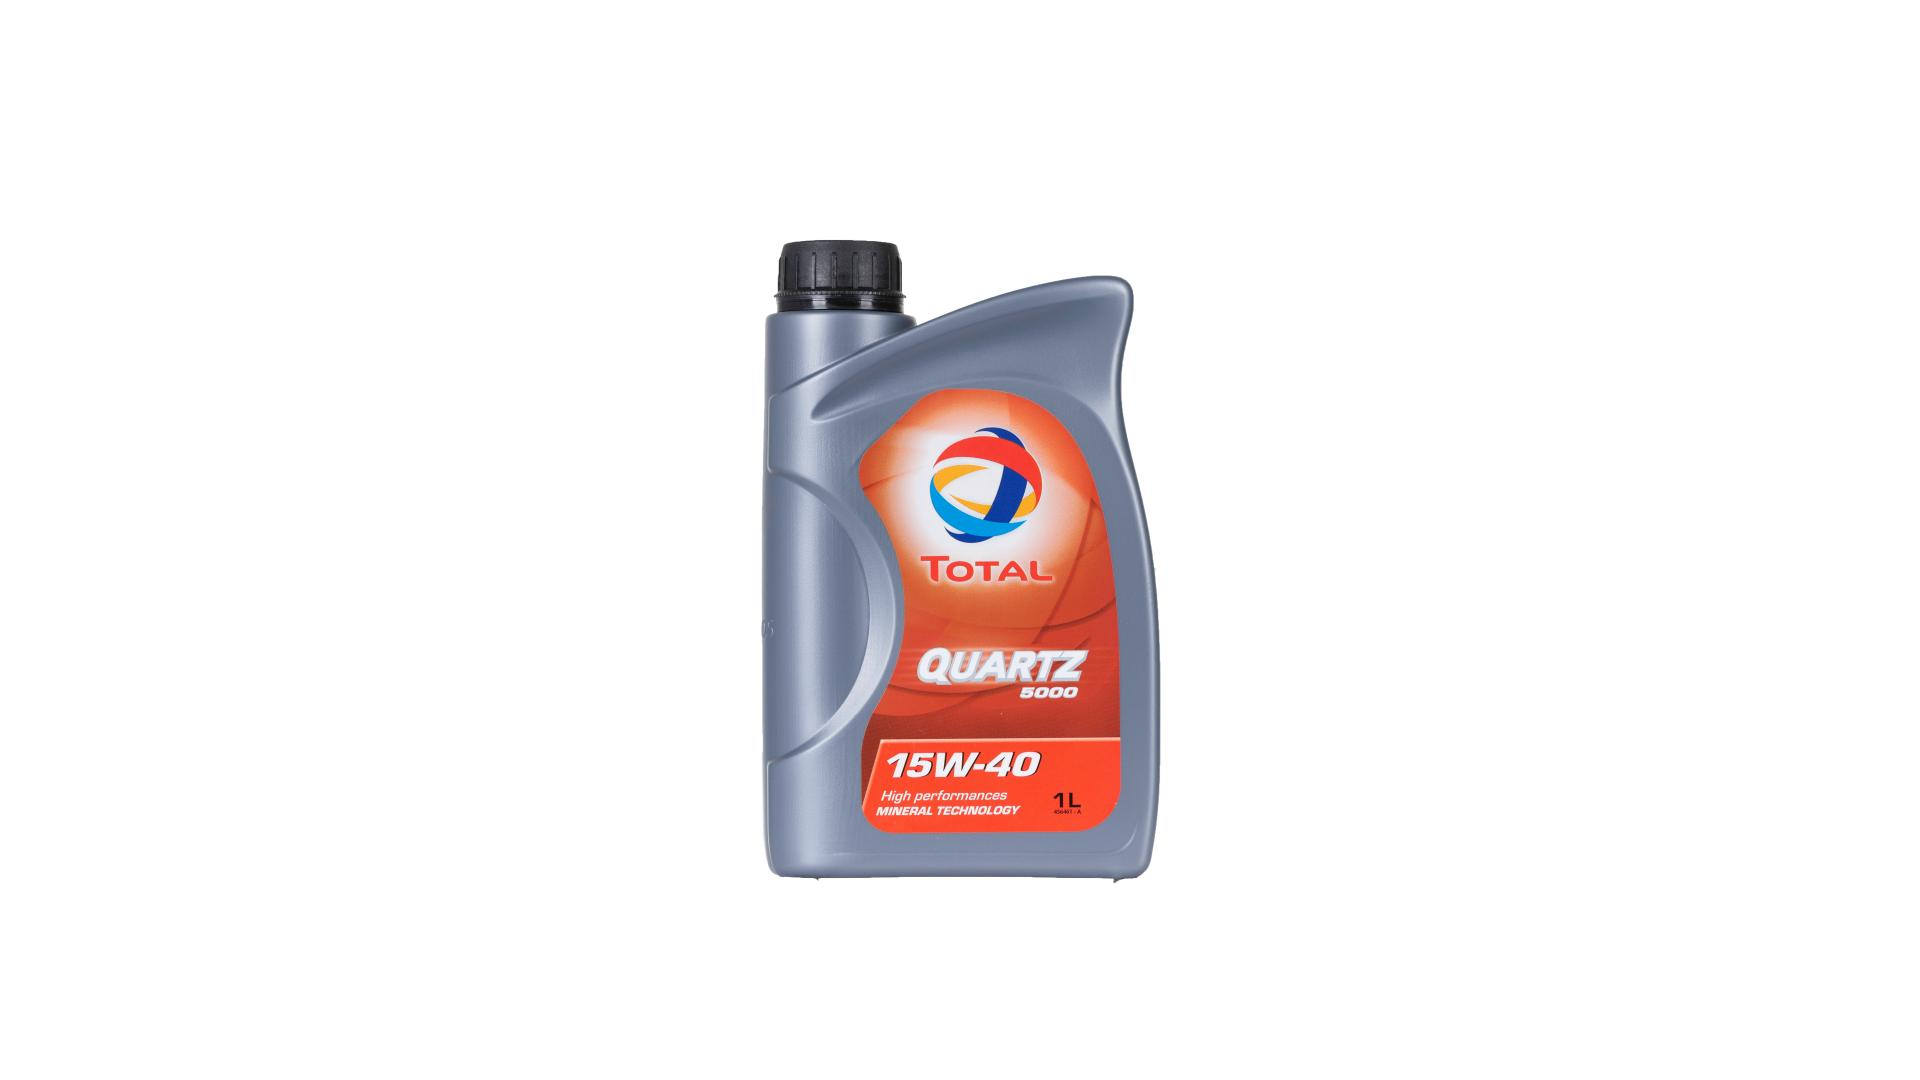 Total 15w-40 Quartz 5000 1L (166236)